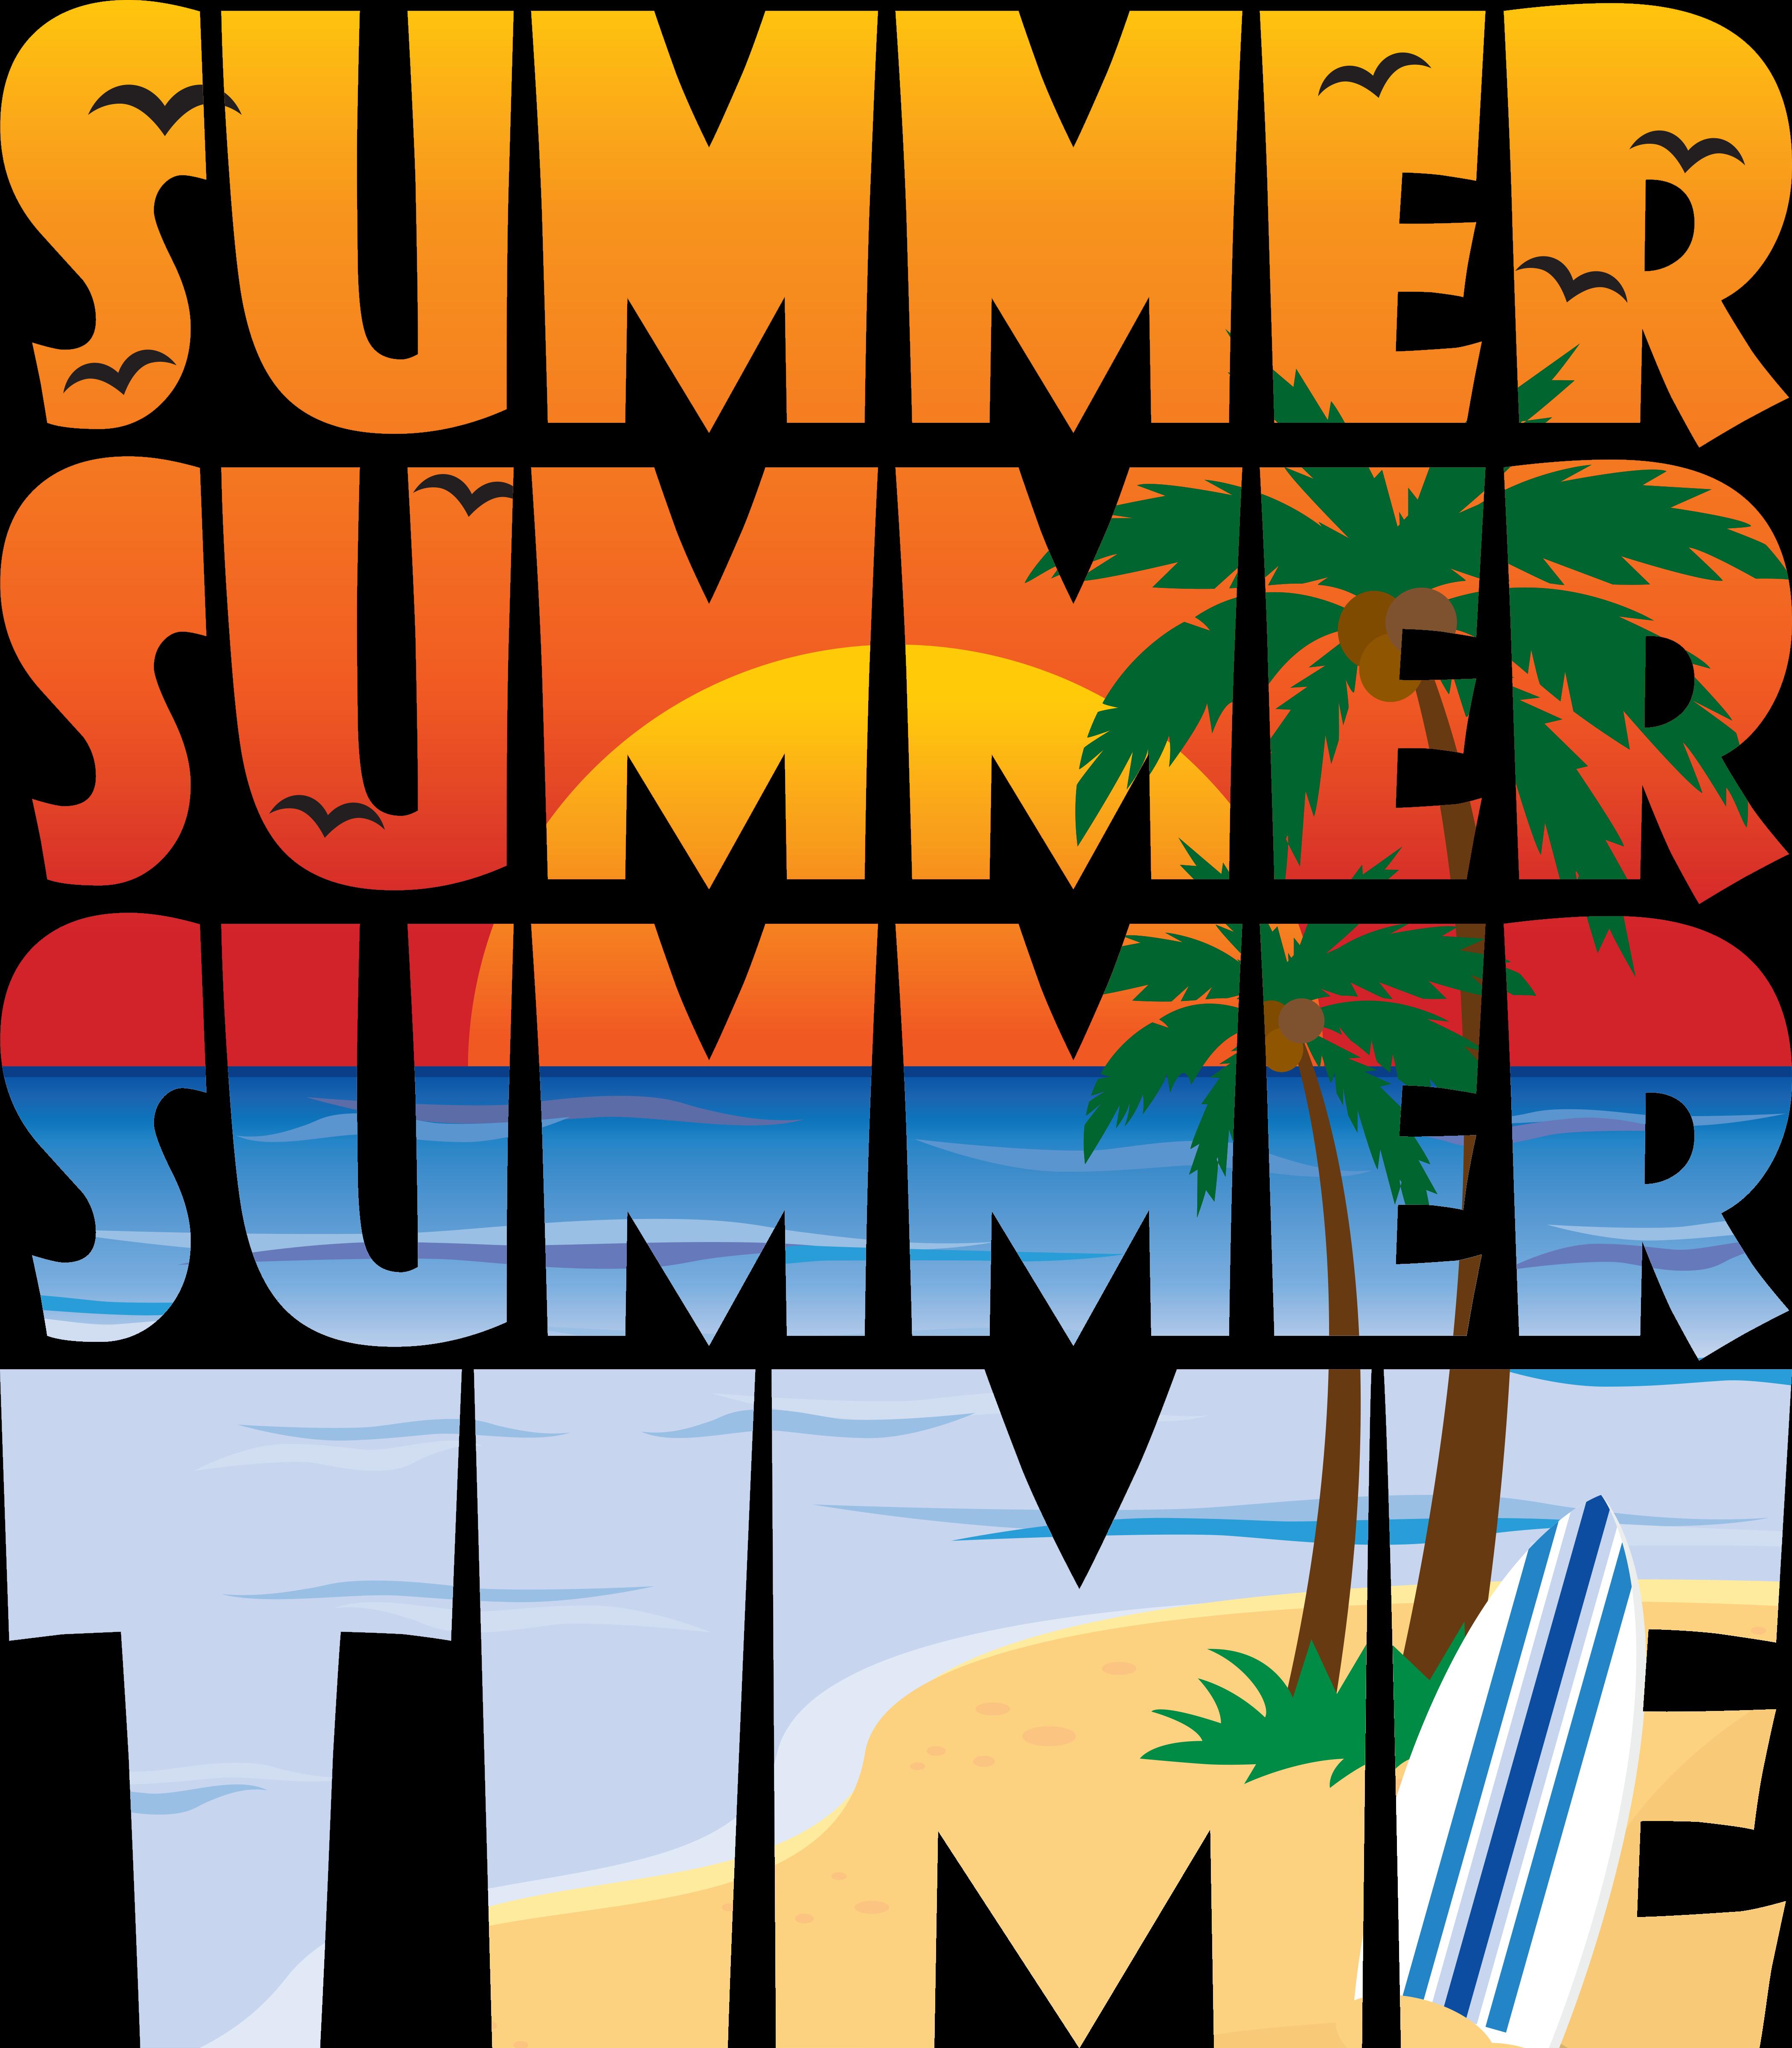 Summer Summer Time Design Illustrated Graphic Design Of A Beach Scene At Sunset Sunrise Summer H Summer Time Pictures Web Banner Design Beach Illustration